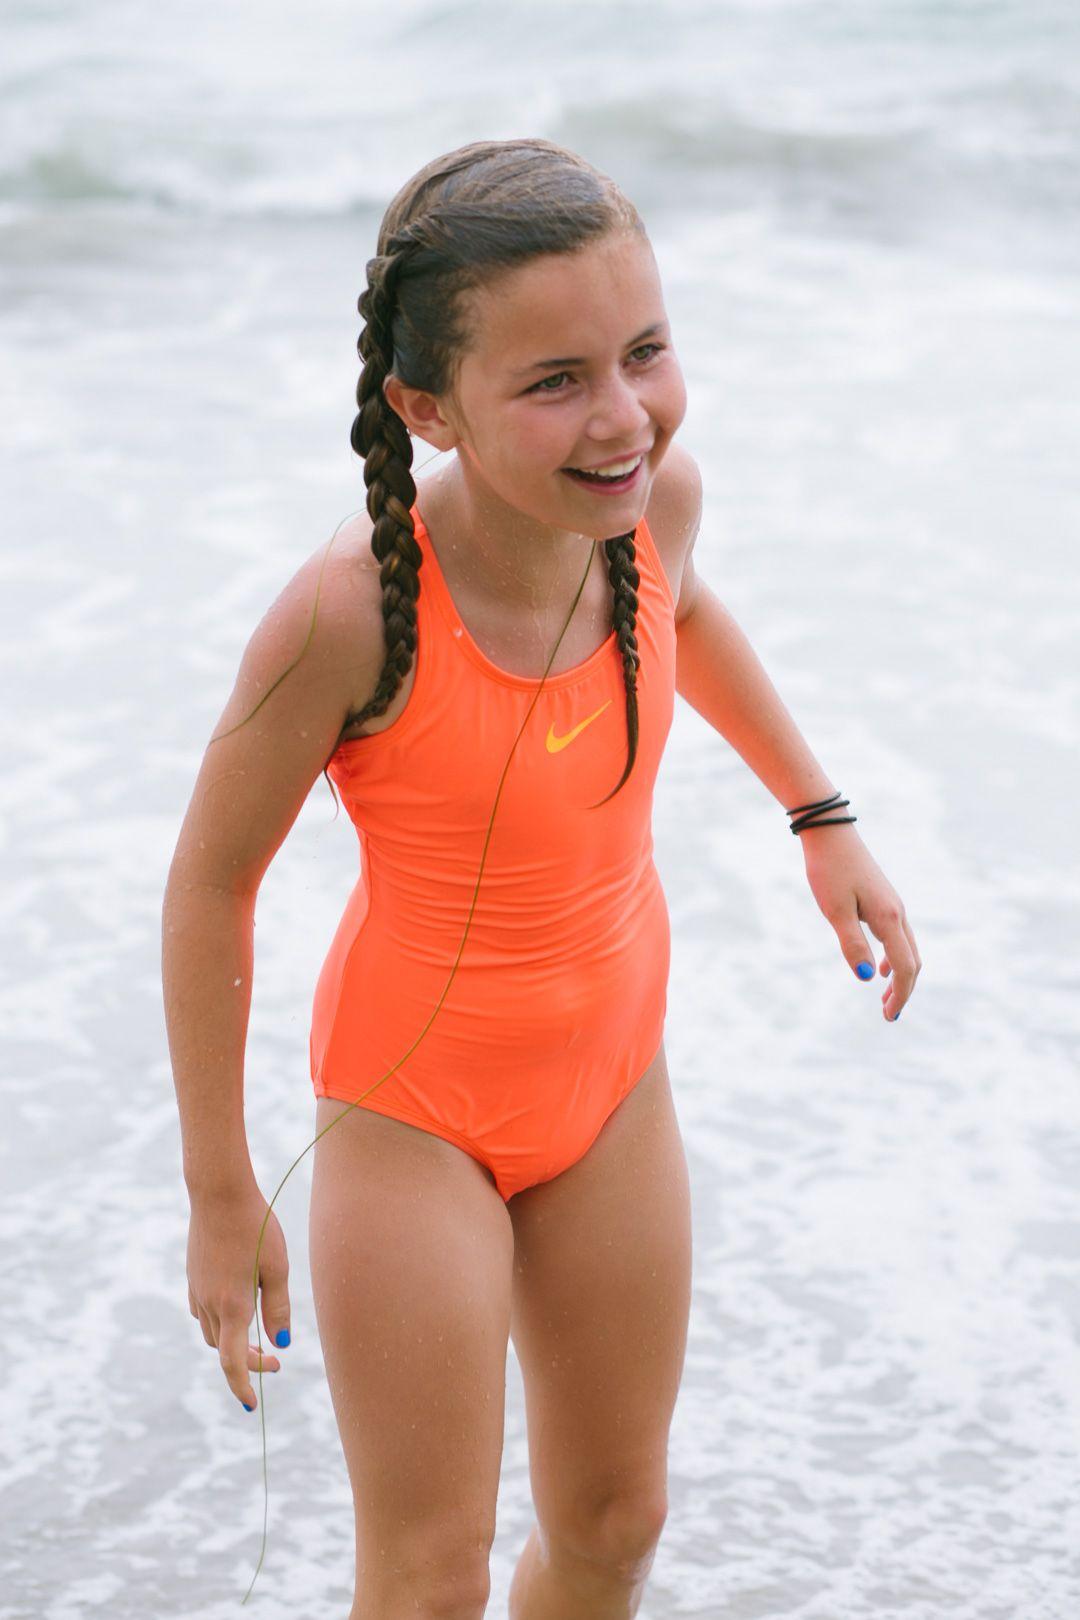 ca7a4098d1138 Kohls has the best kids swimwear right now on sale! Super fun, bright,  modest swimwear for girls.